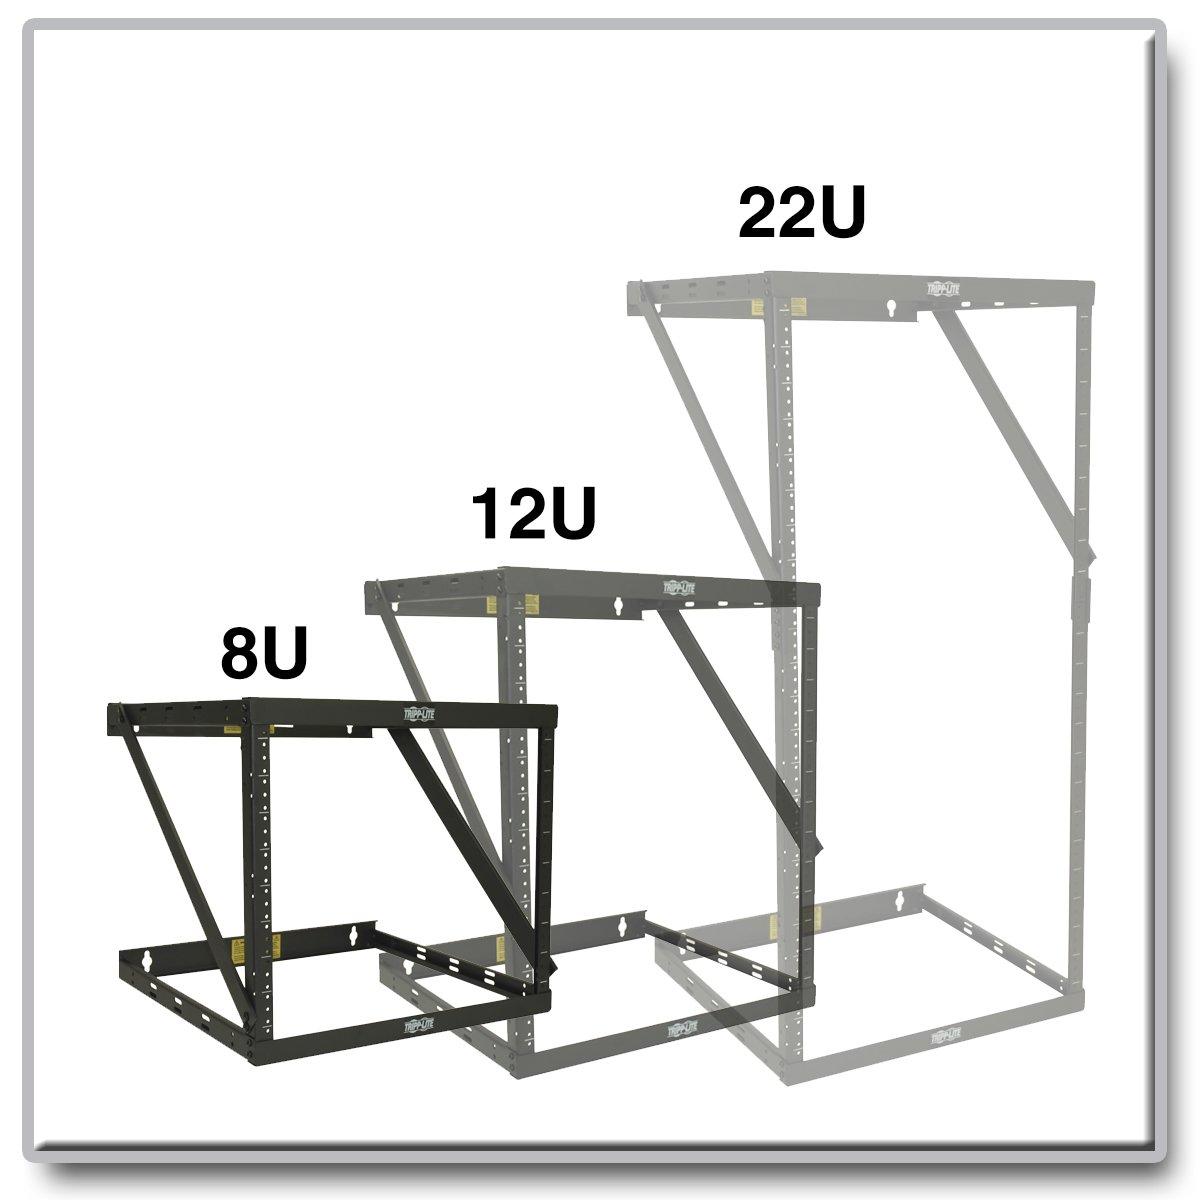 Tripp Lite 8U/12U/22U Expandable Wall-Mount 2-Post Open Frame Rack, Adjustable Network Equipment Rack, Switch Depth, 18'' Deep (SRWO8U22) by Tripp Lite (Image #4)